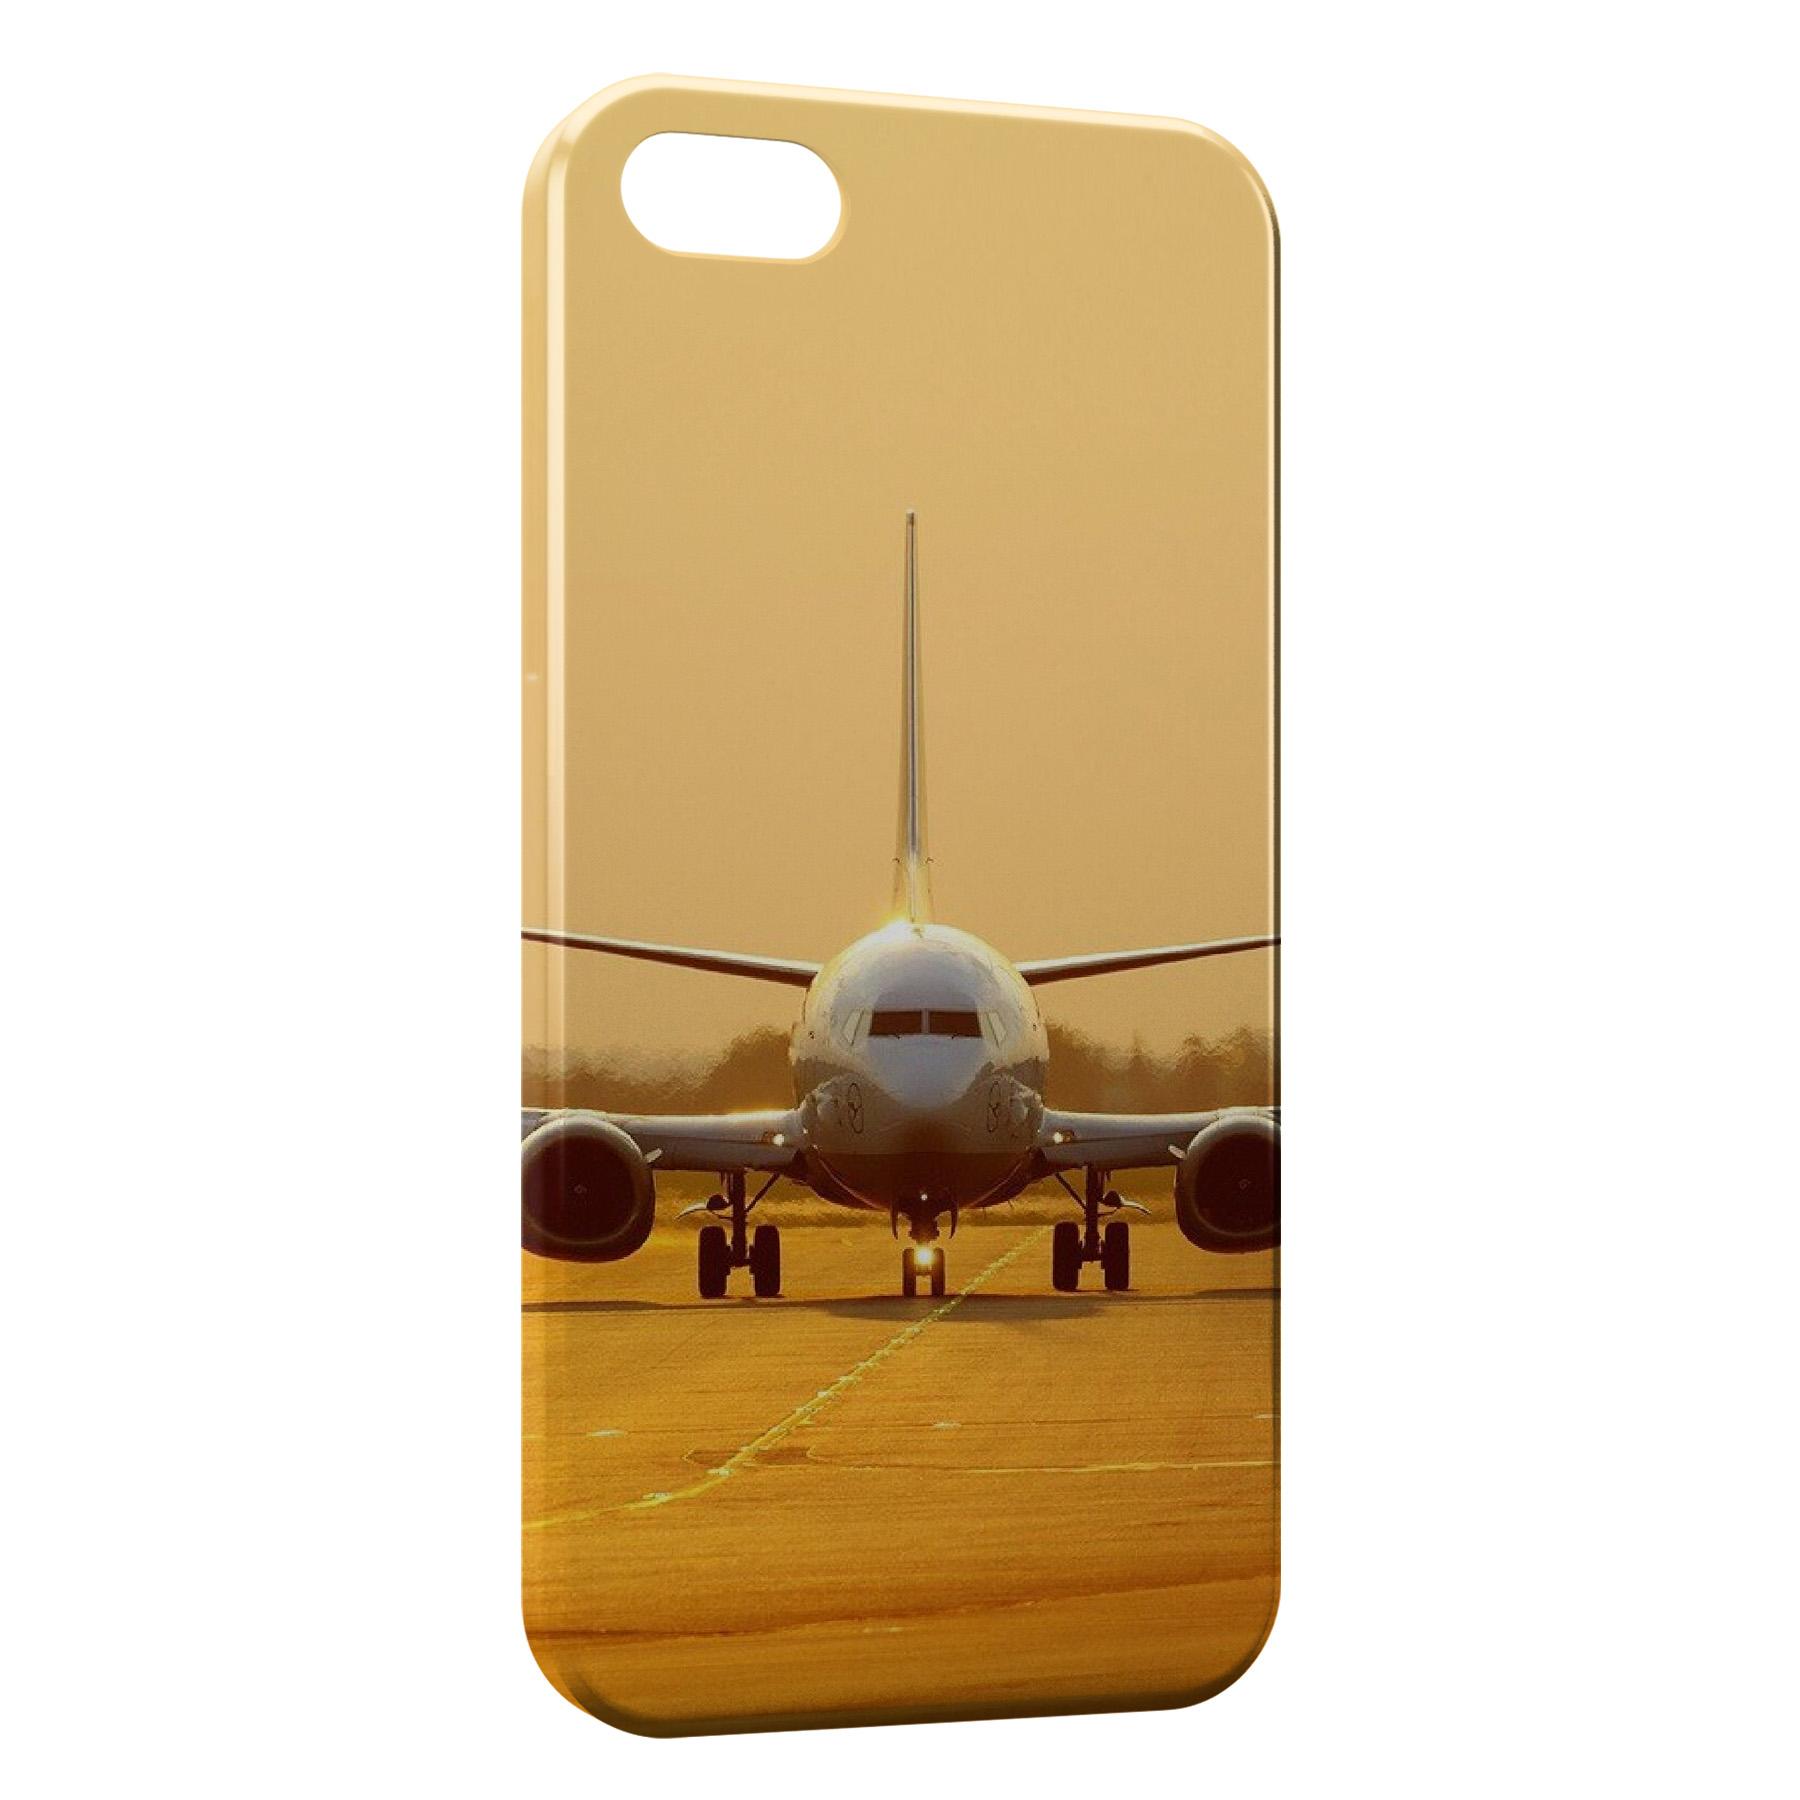 Coque iPhone 4 & 4S Avion Sunshine